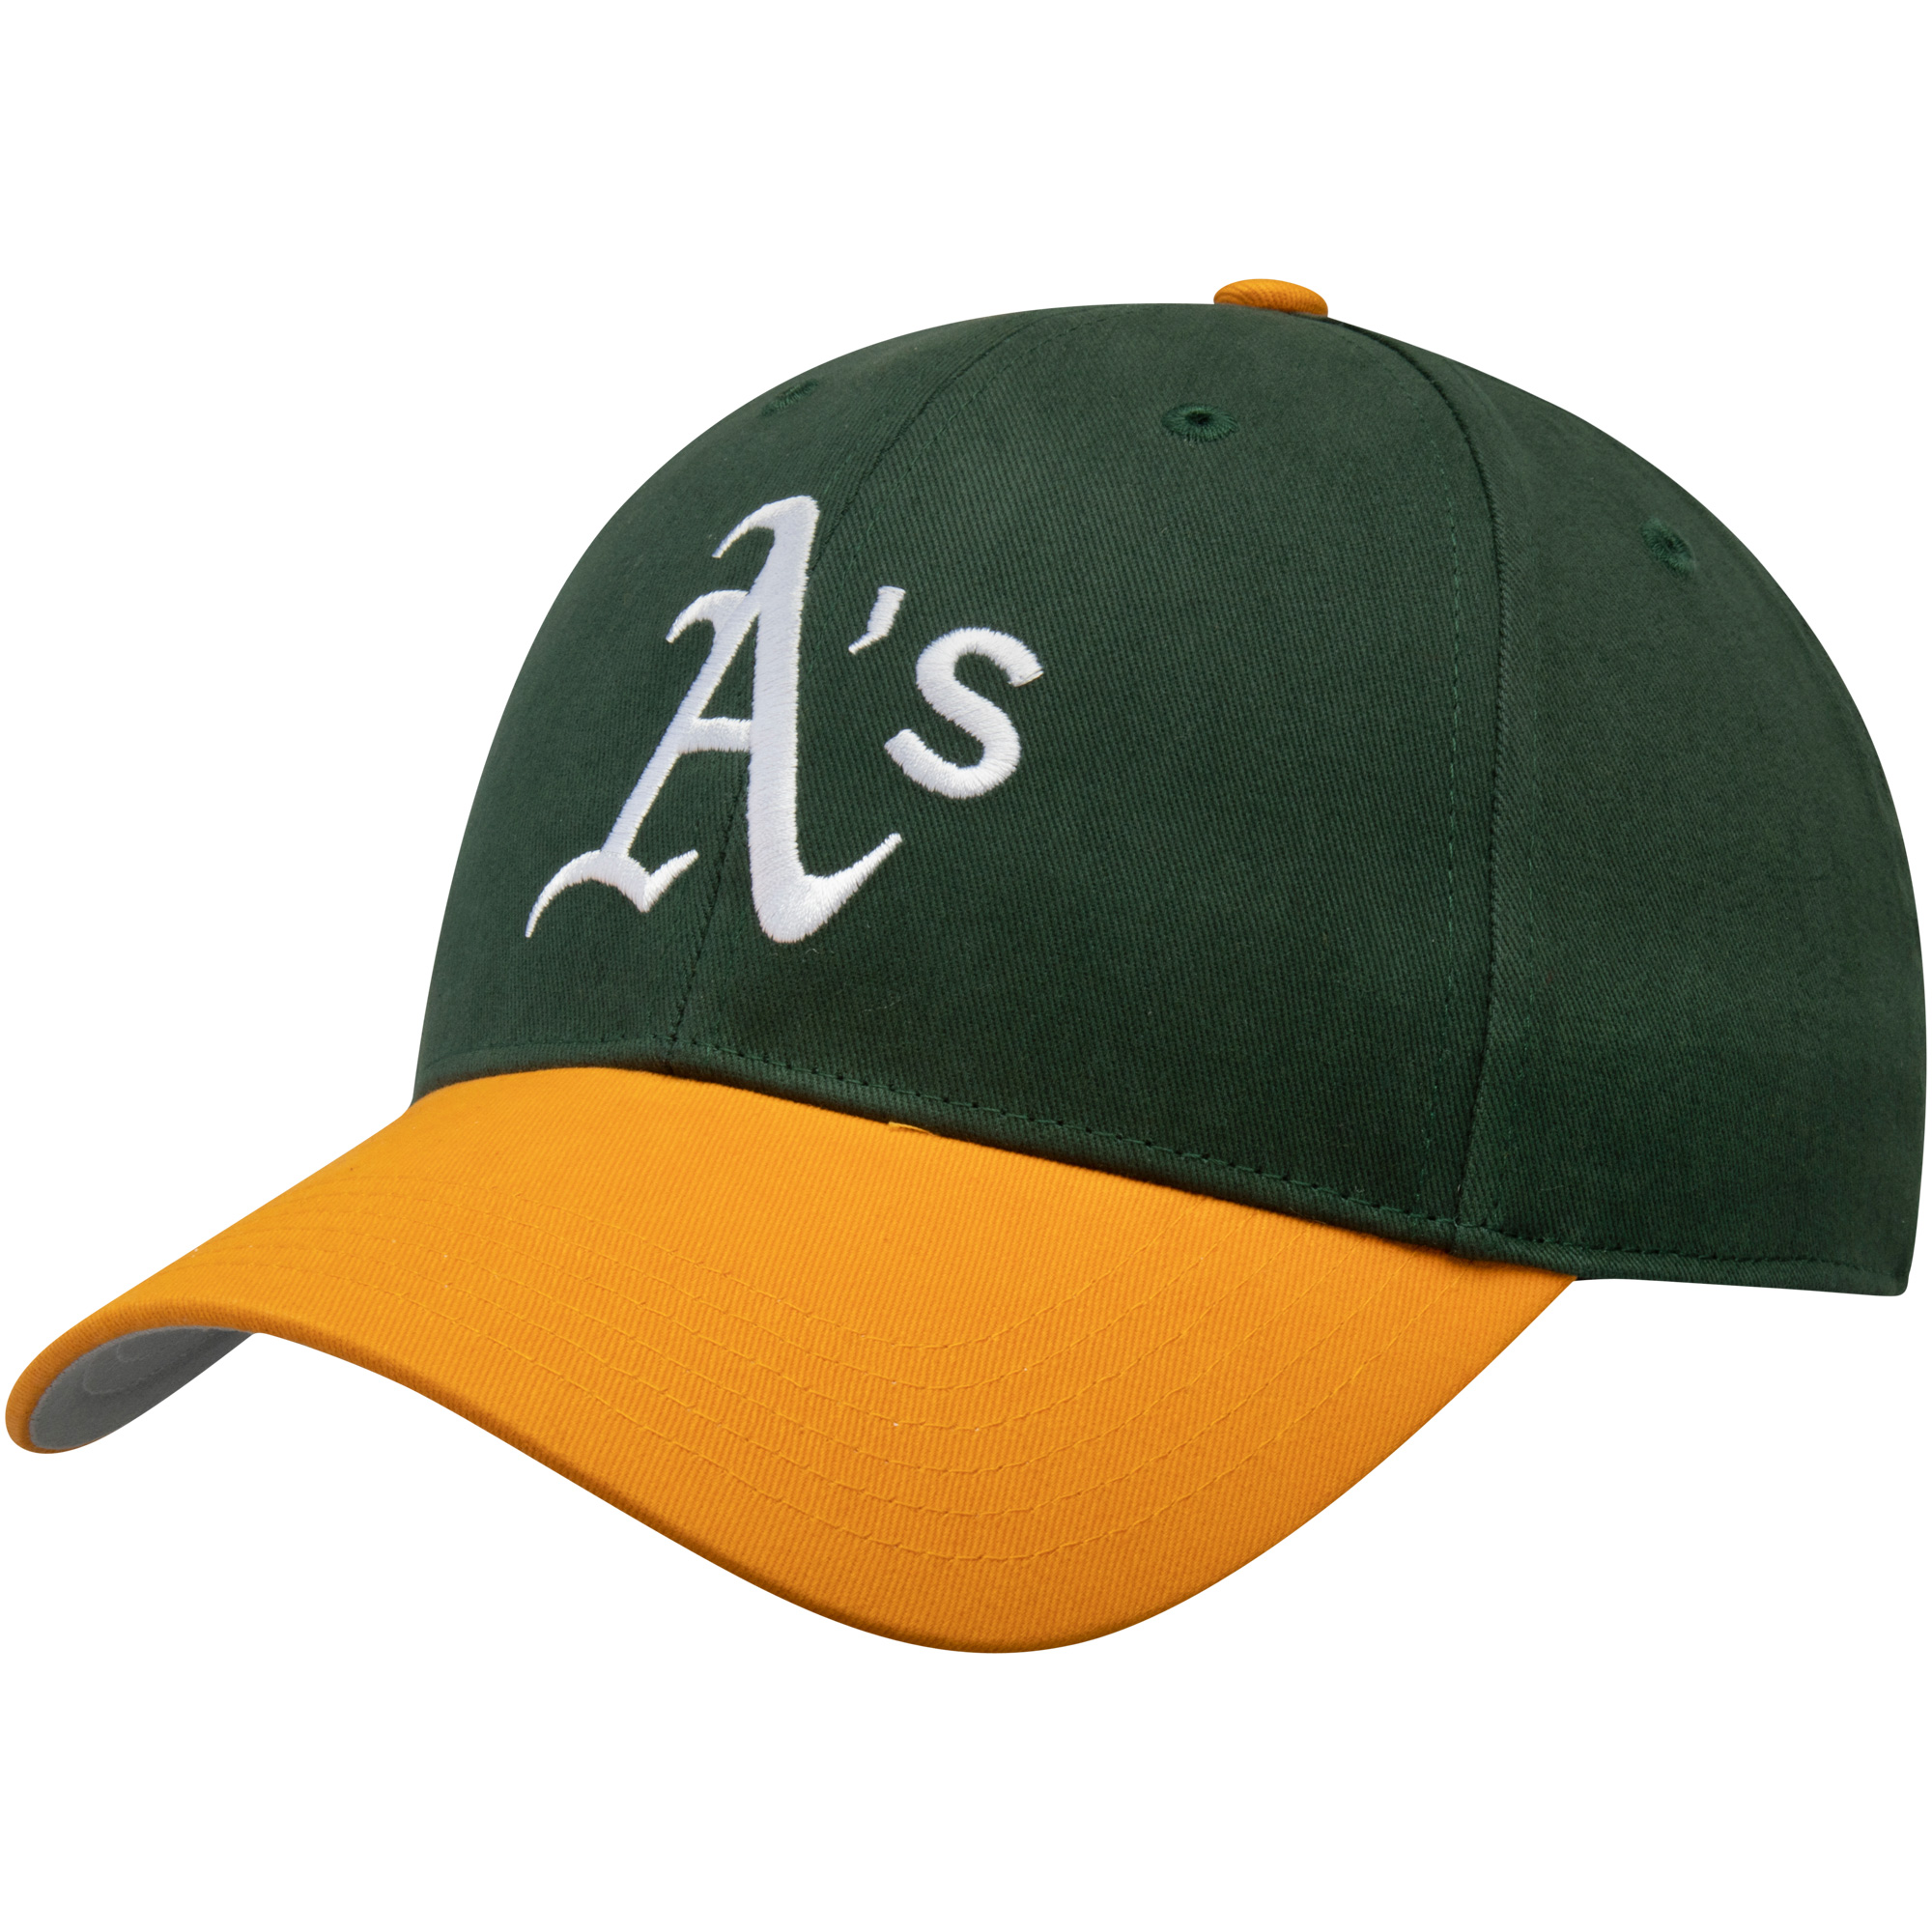 Oakland Athletics Fan Favorite Basic Adjustable Hat - Green - OSFA